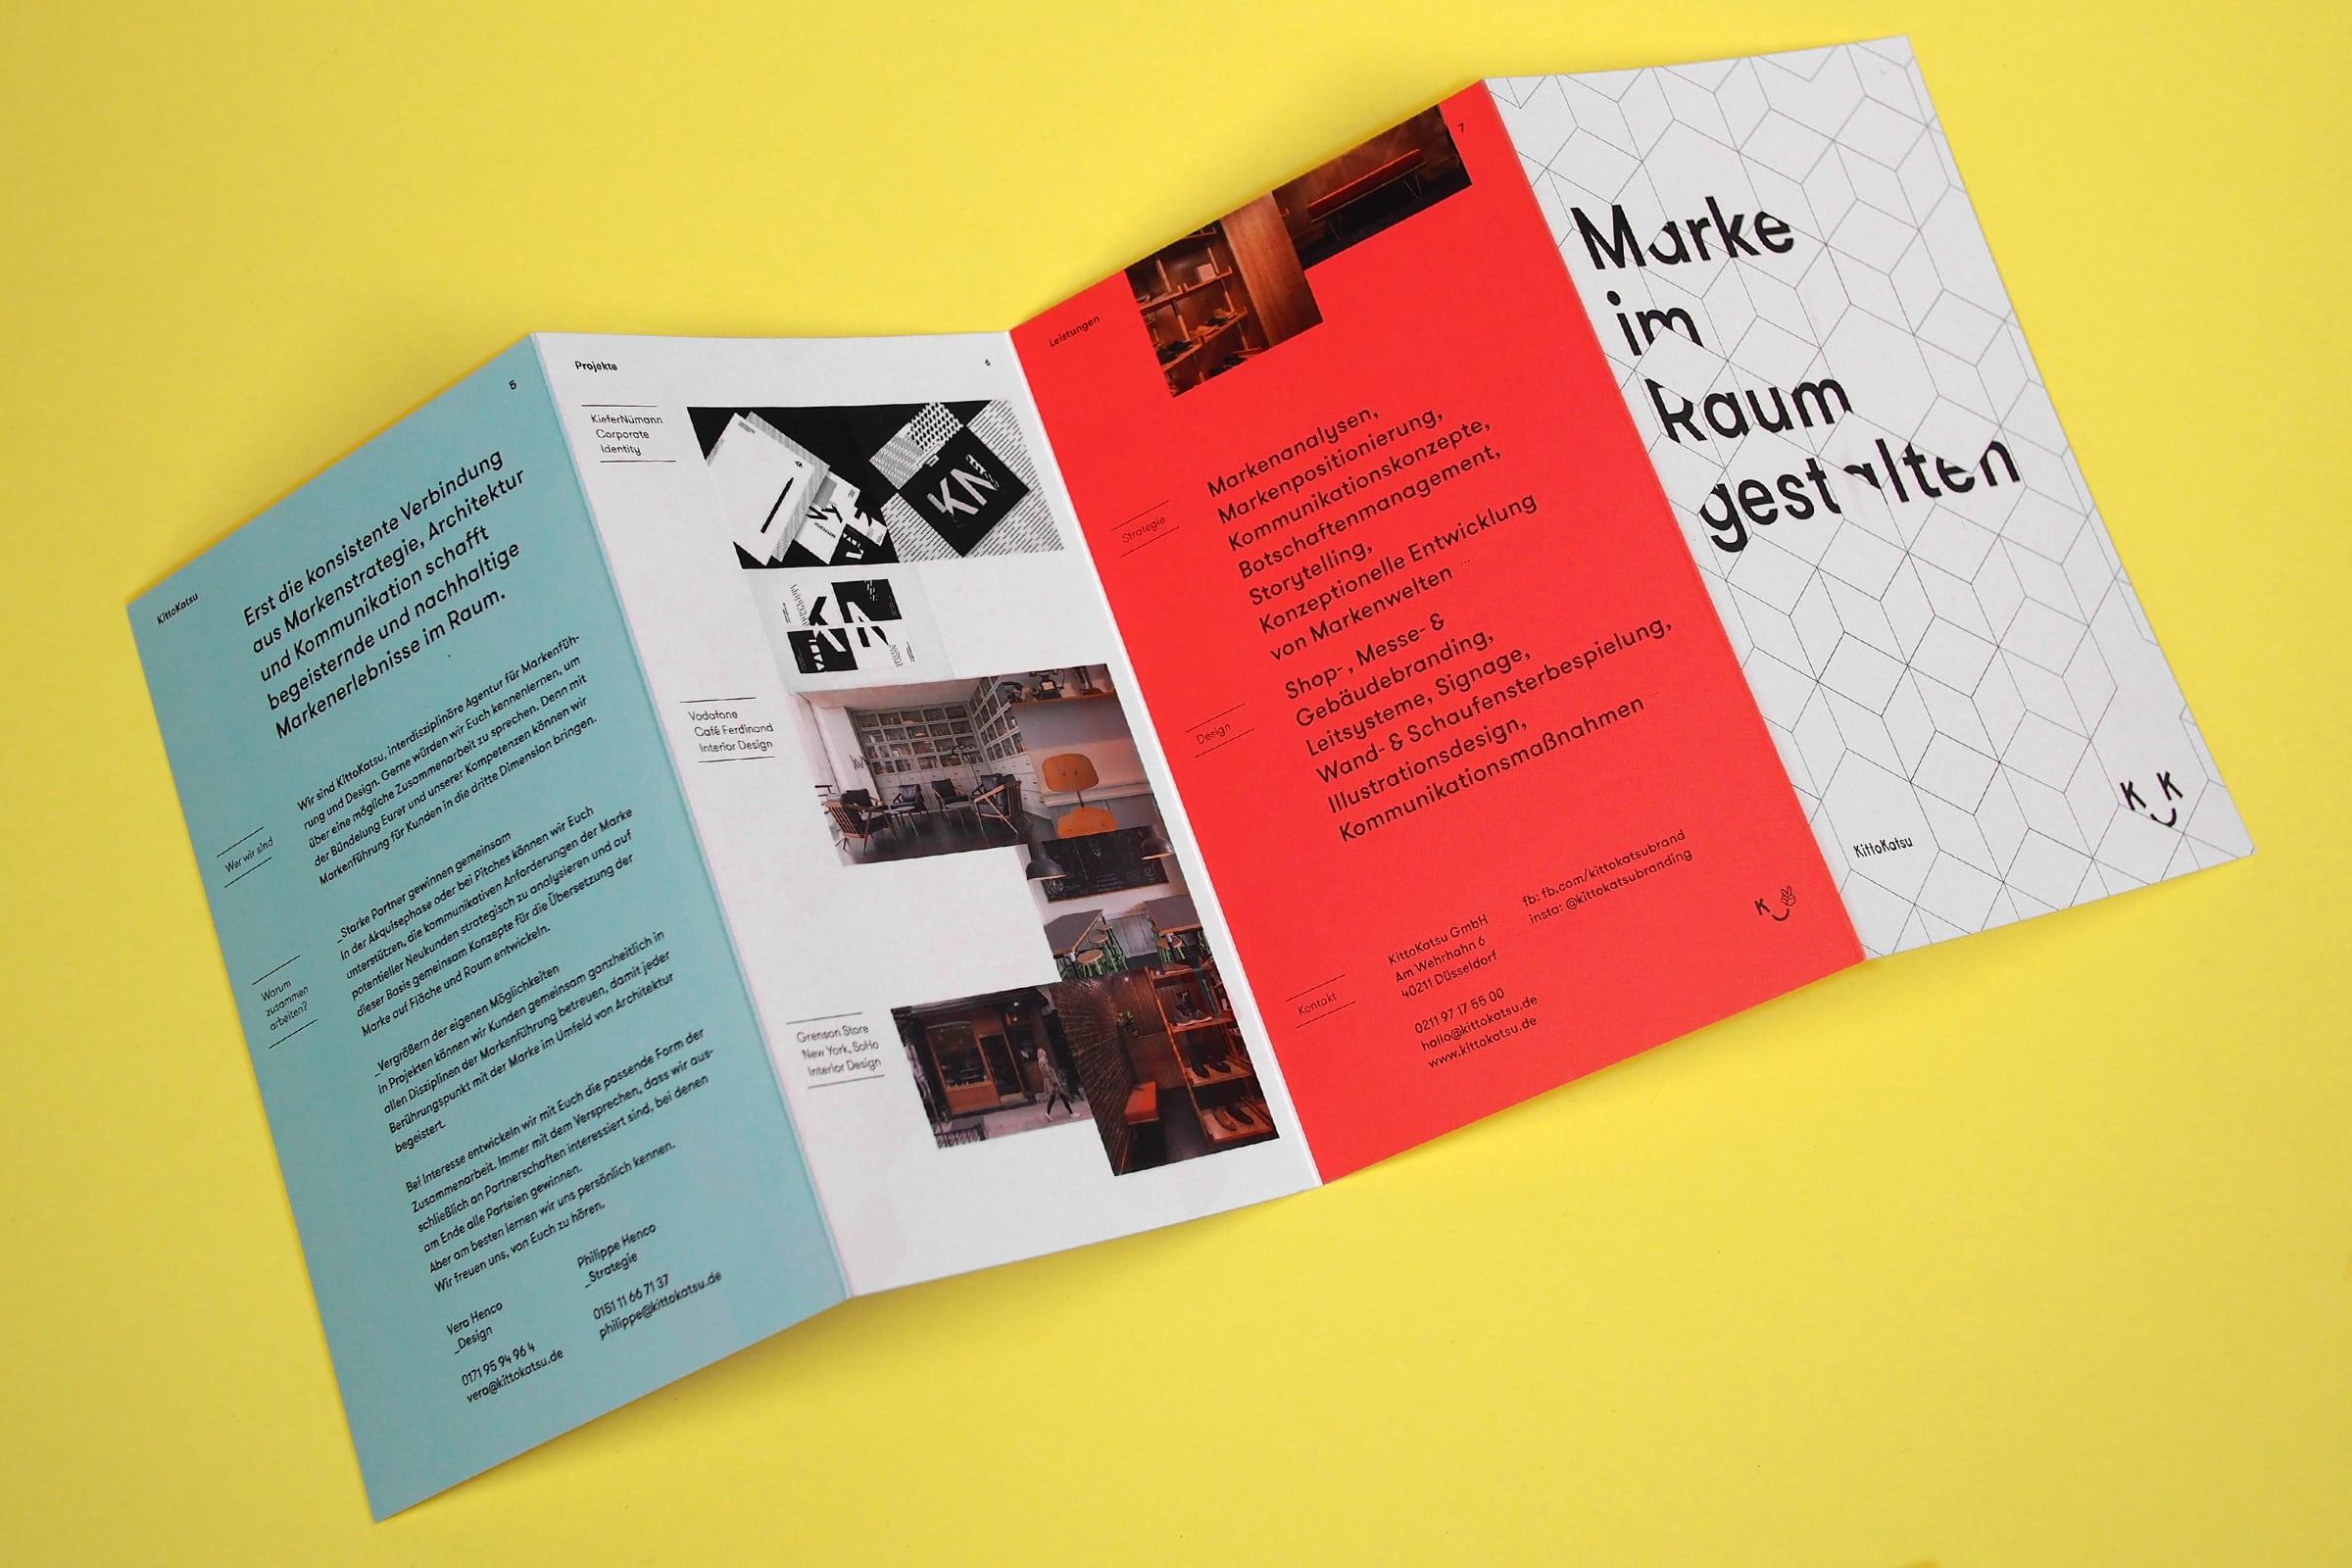 Marke im Raum, 3D Marke, Kommunikation im Raum, Vodafone, Grenson